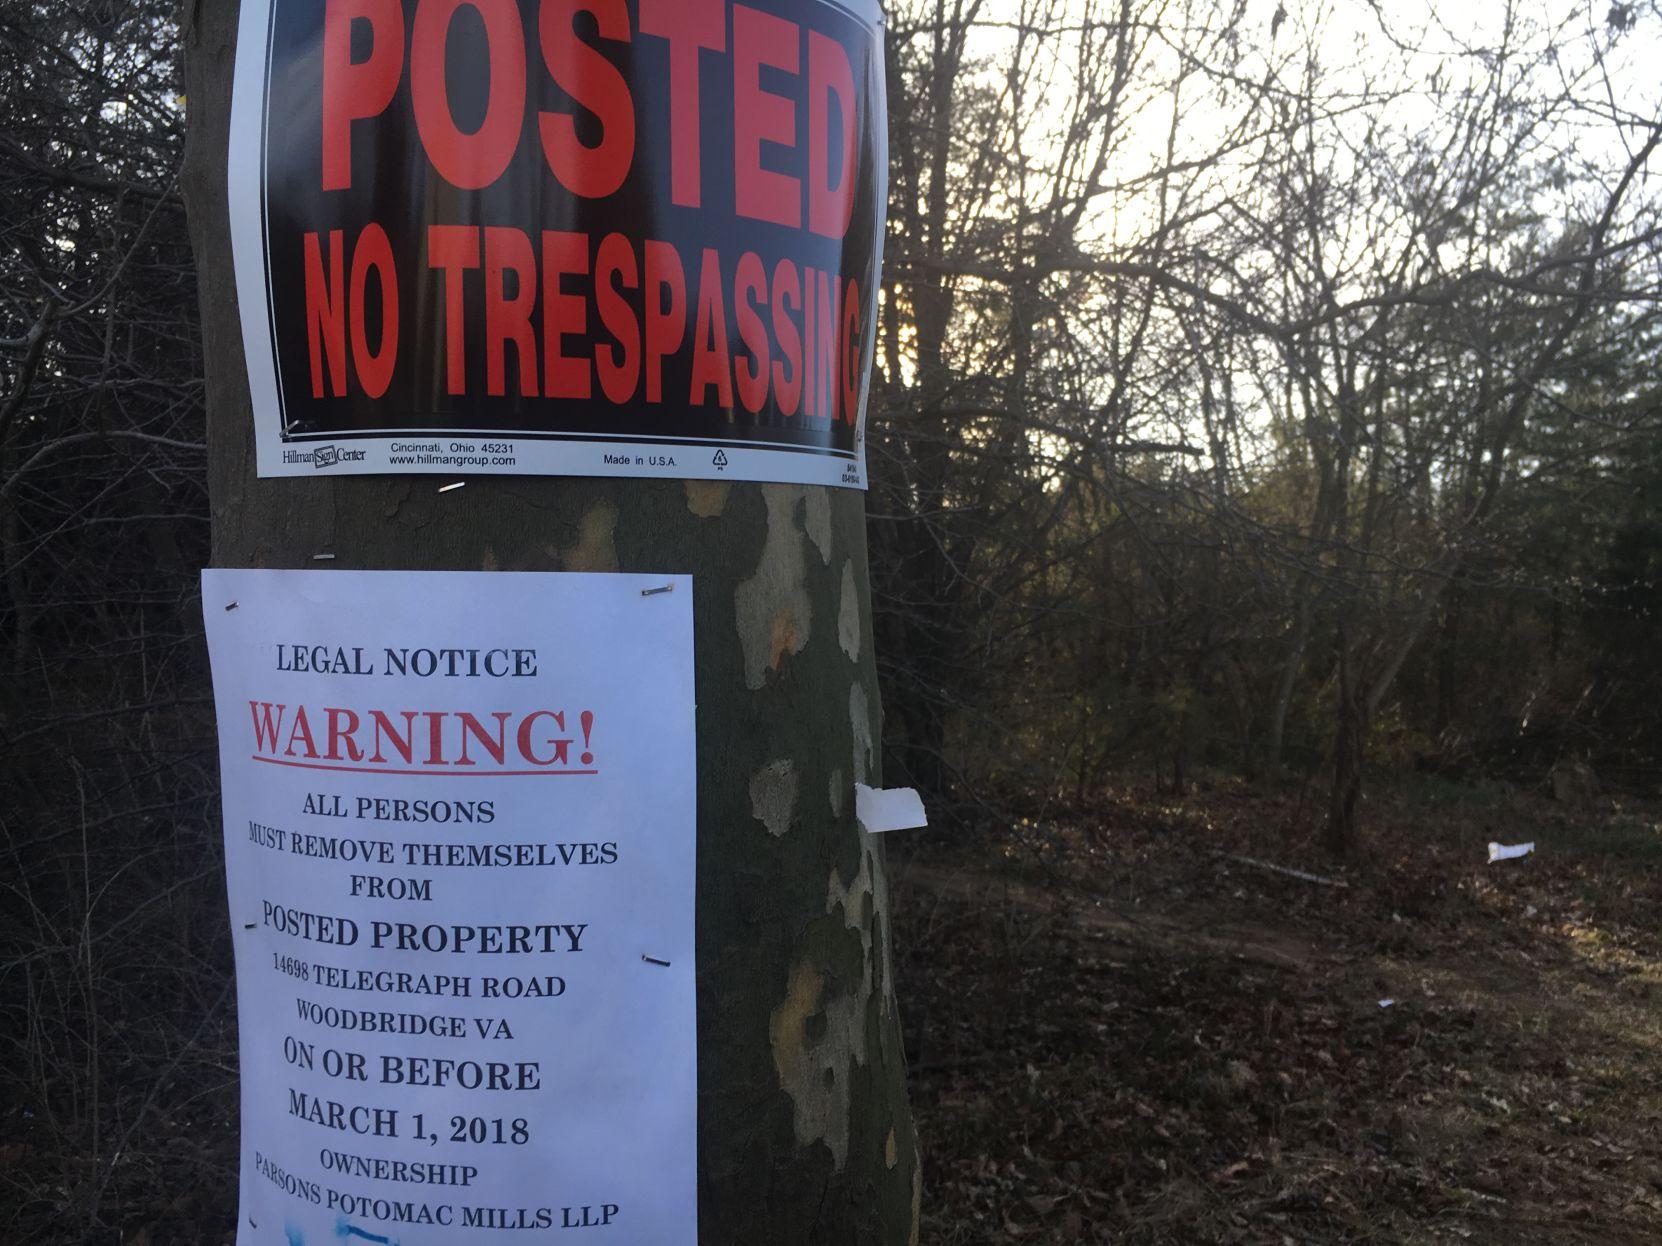 Parsons Potomac Mills No Trespassing